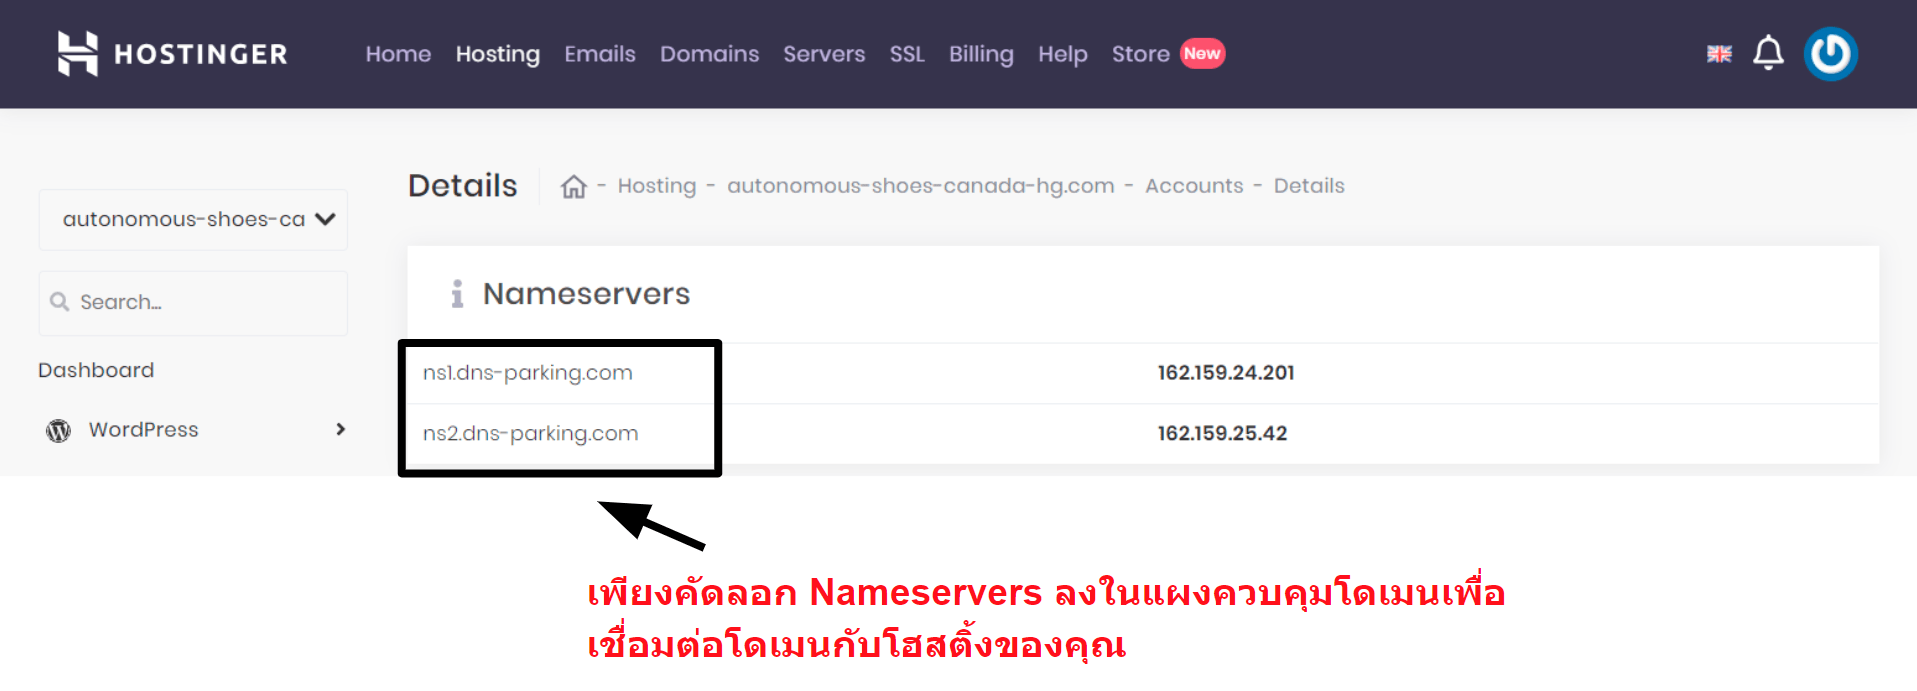 Hostinger domain connection information_TH